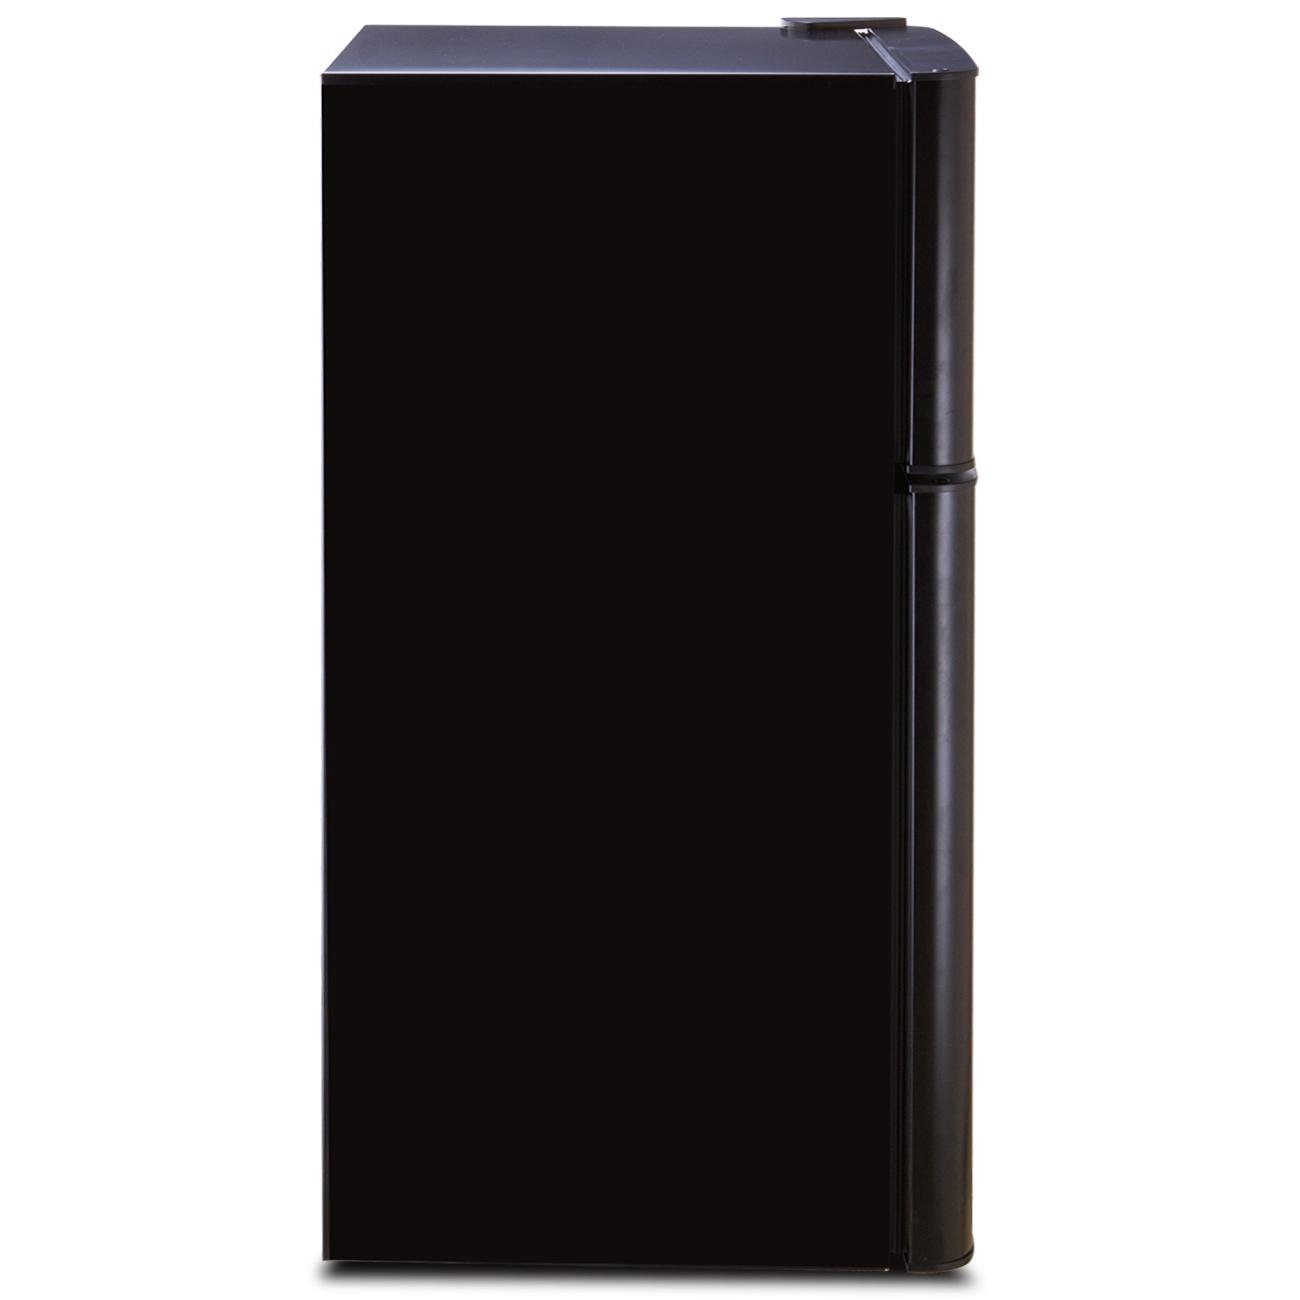 Office Fridge: New Compact 4.5 Cu Ft Fridge Mini Dorm Office Refrigerator